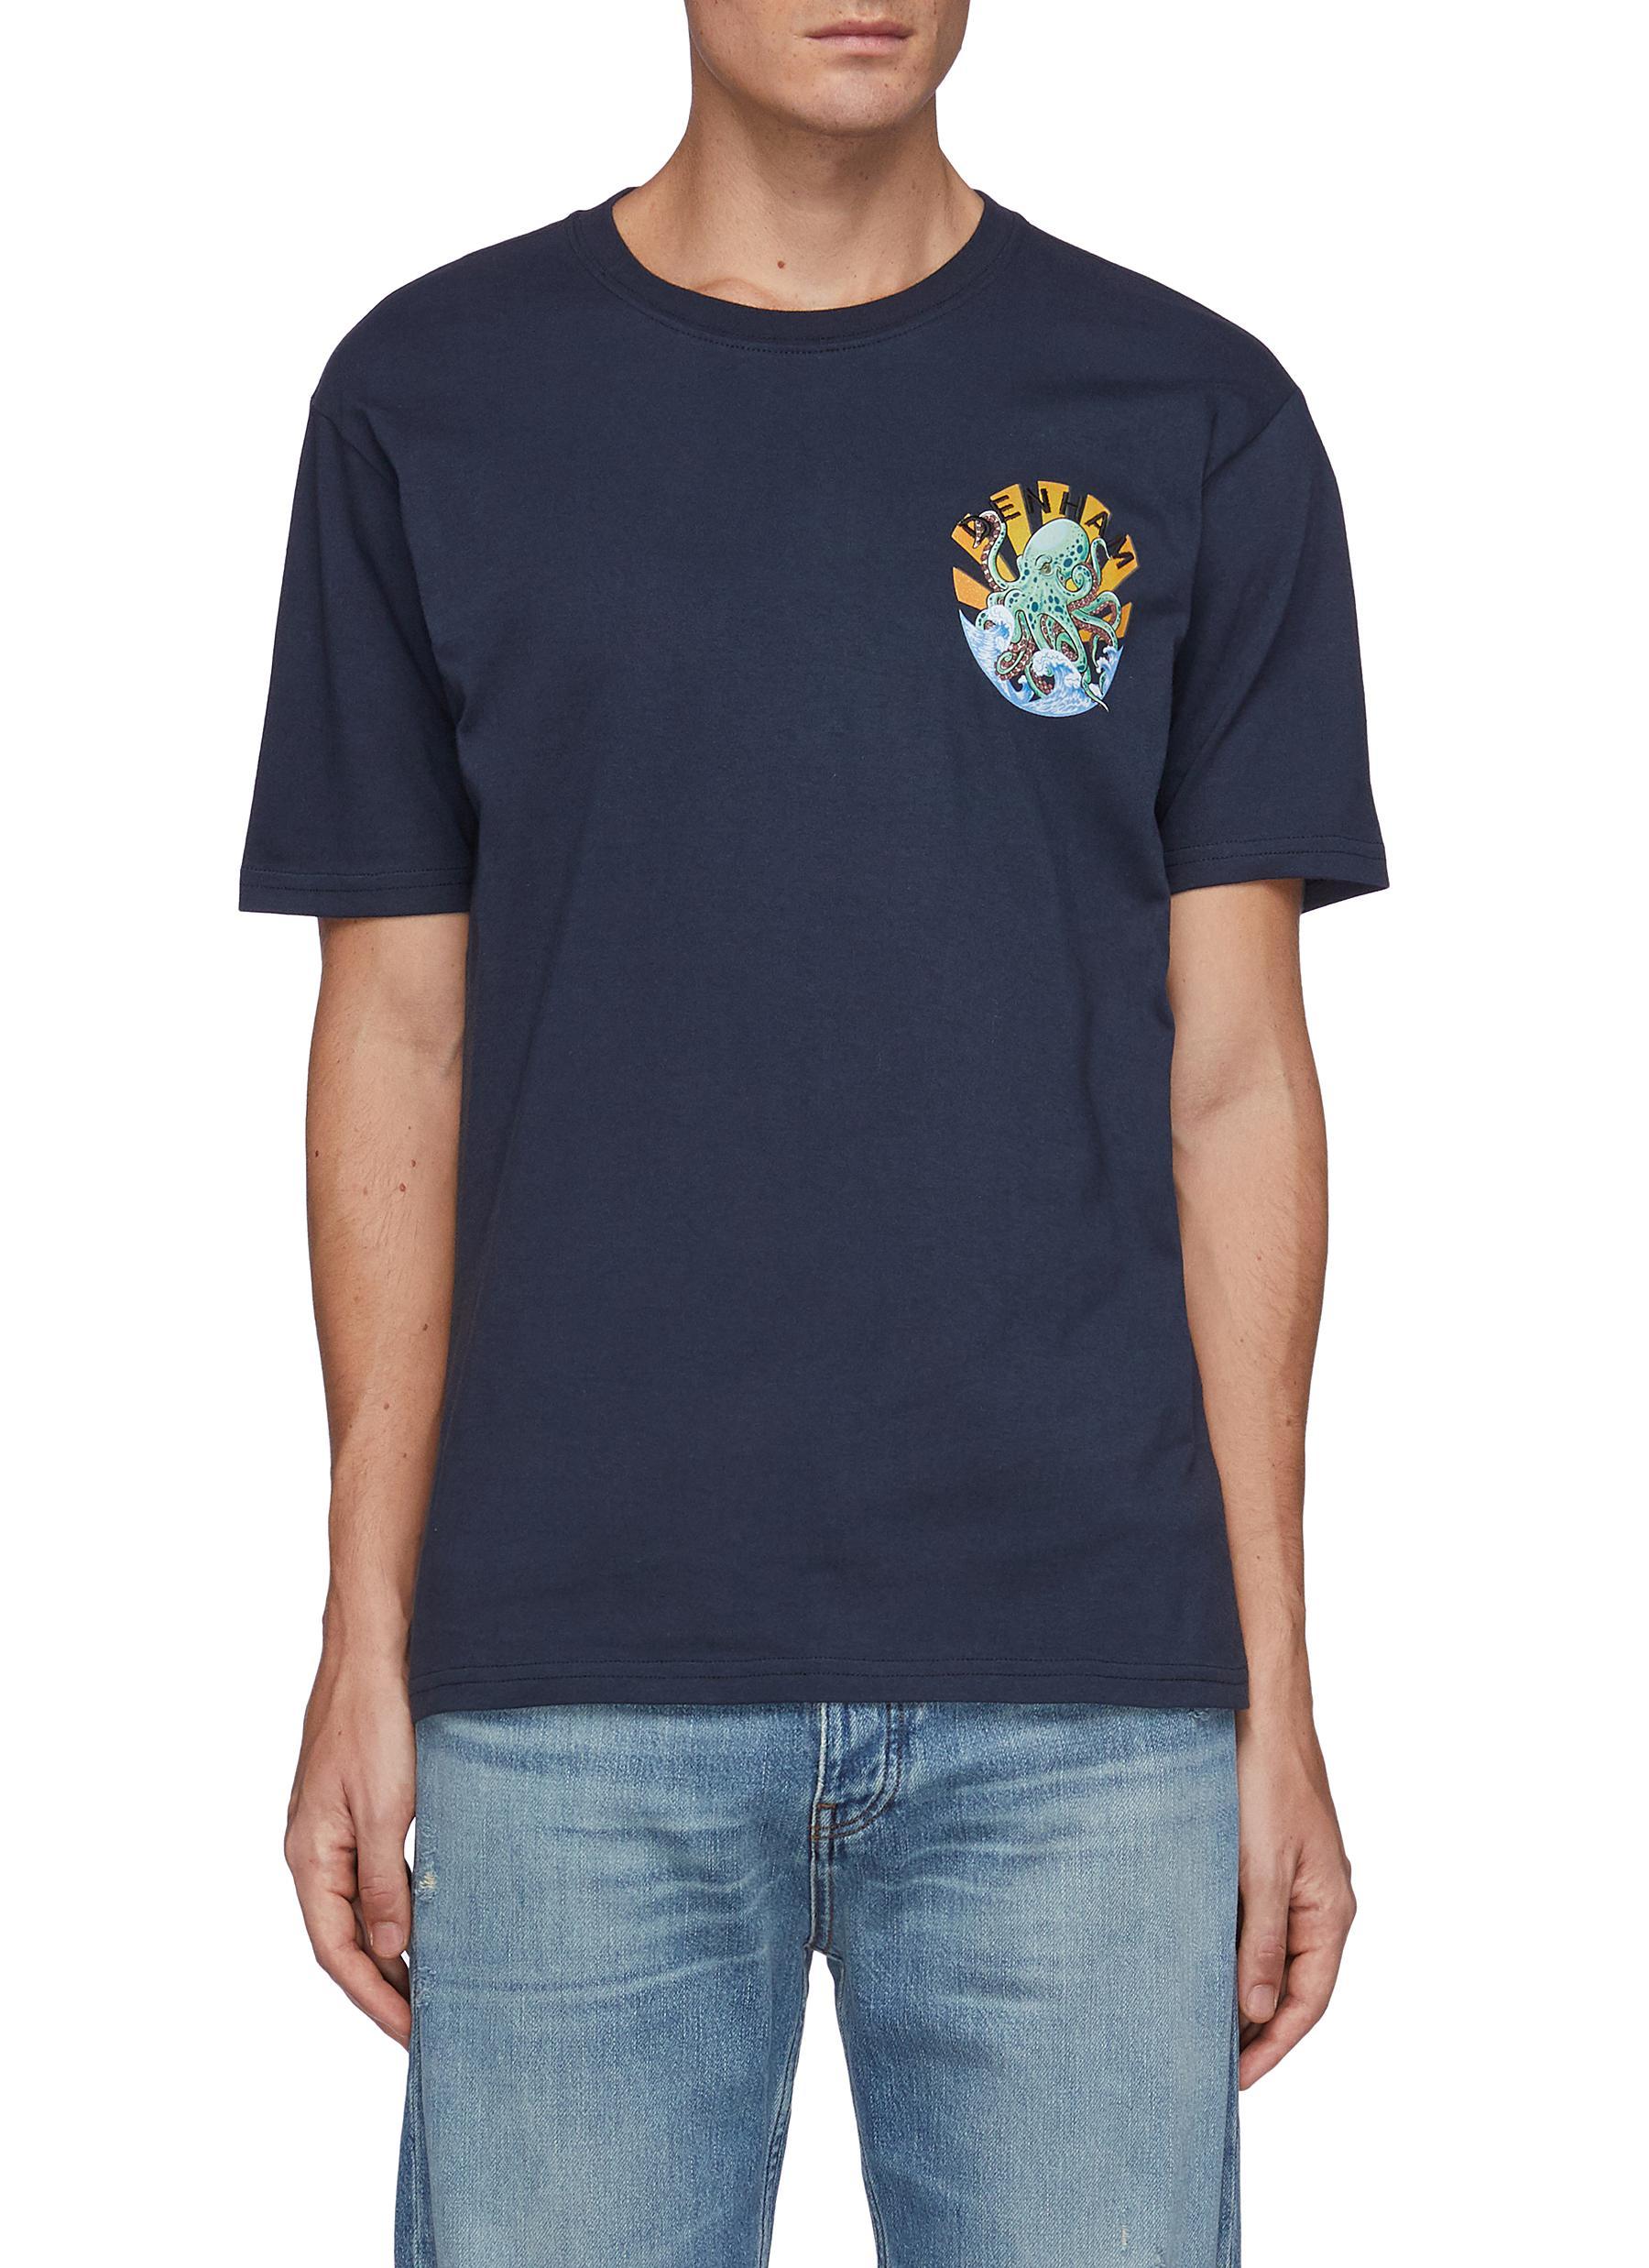 Jayden' Octopus Print Cotton Crewneck T-Shirt